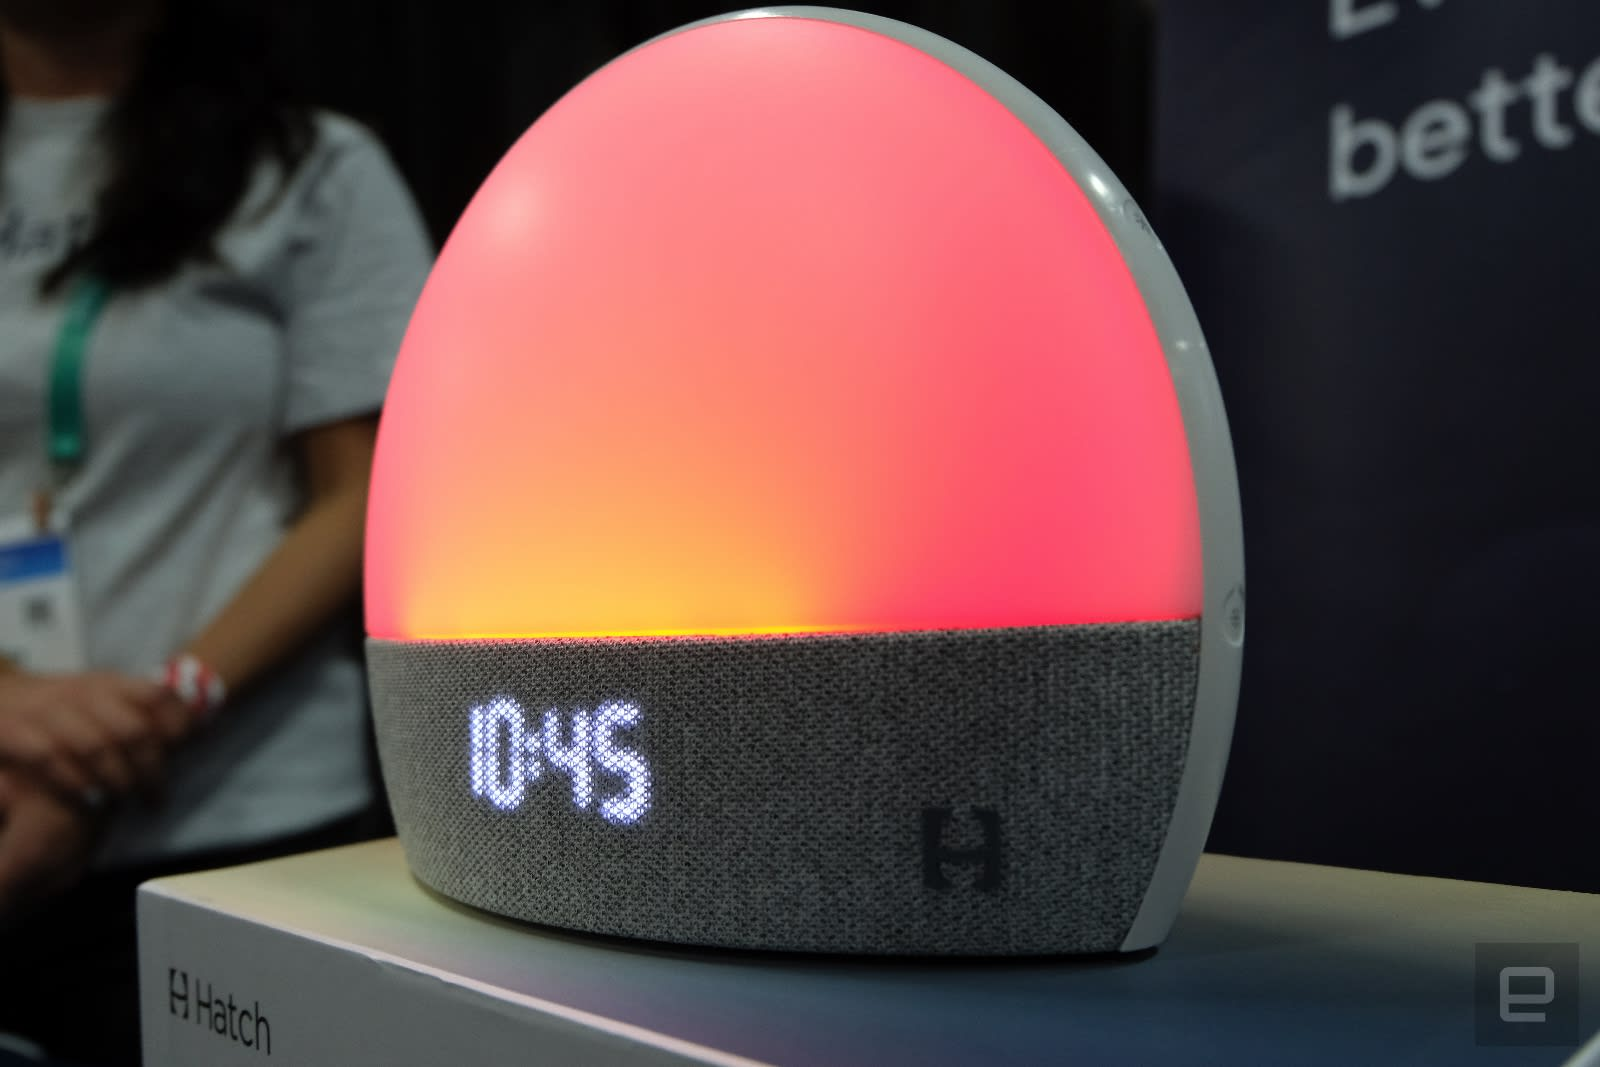 Hatch alarm clock